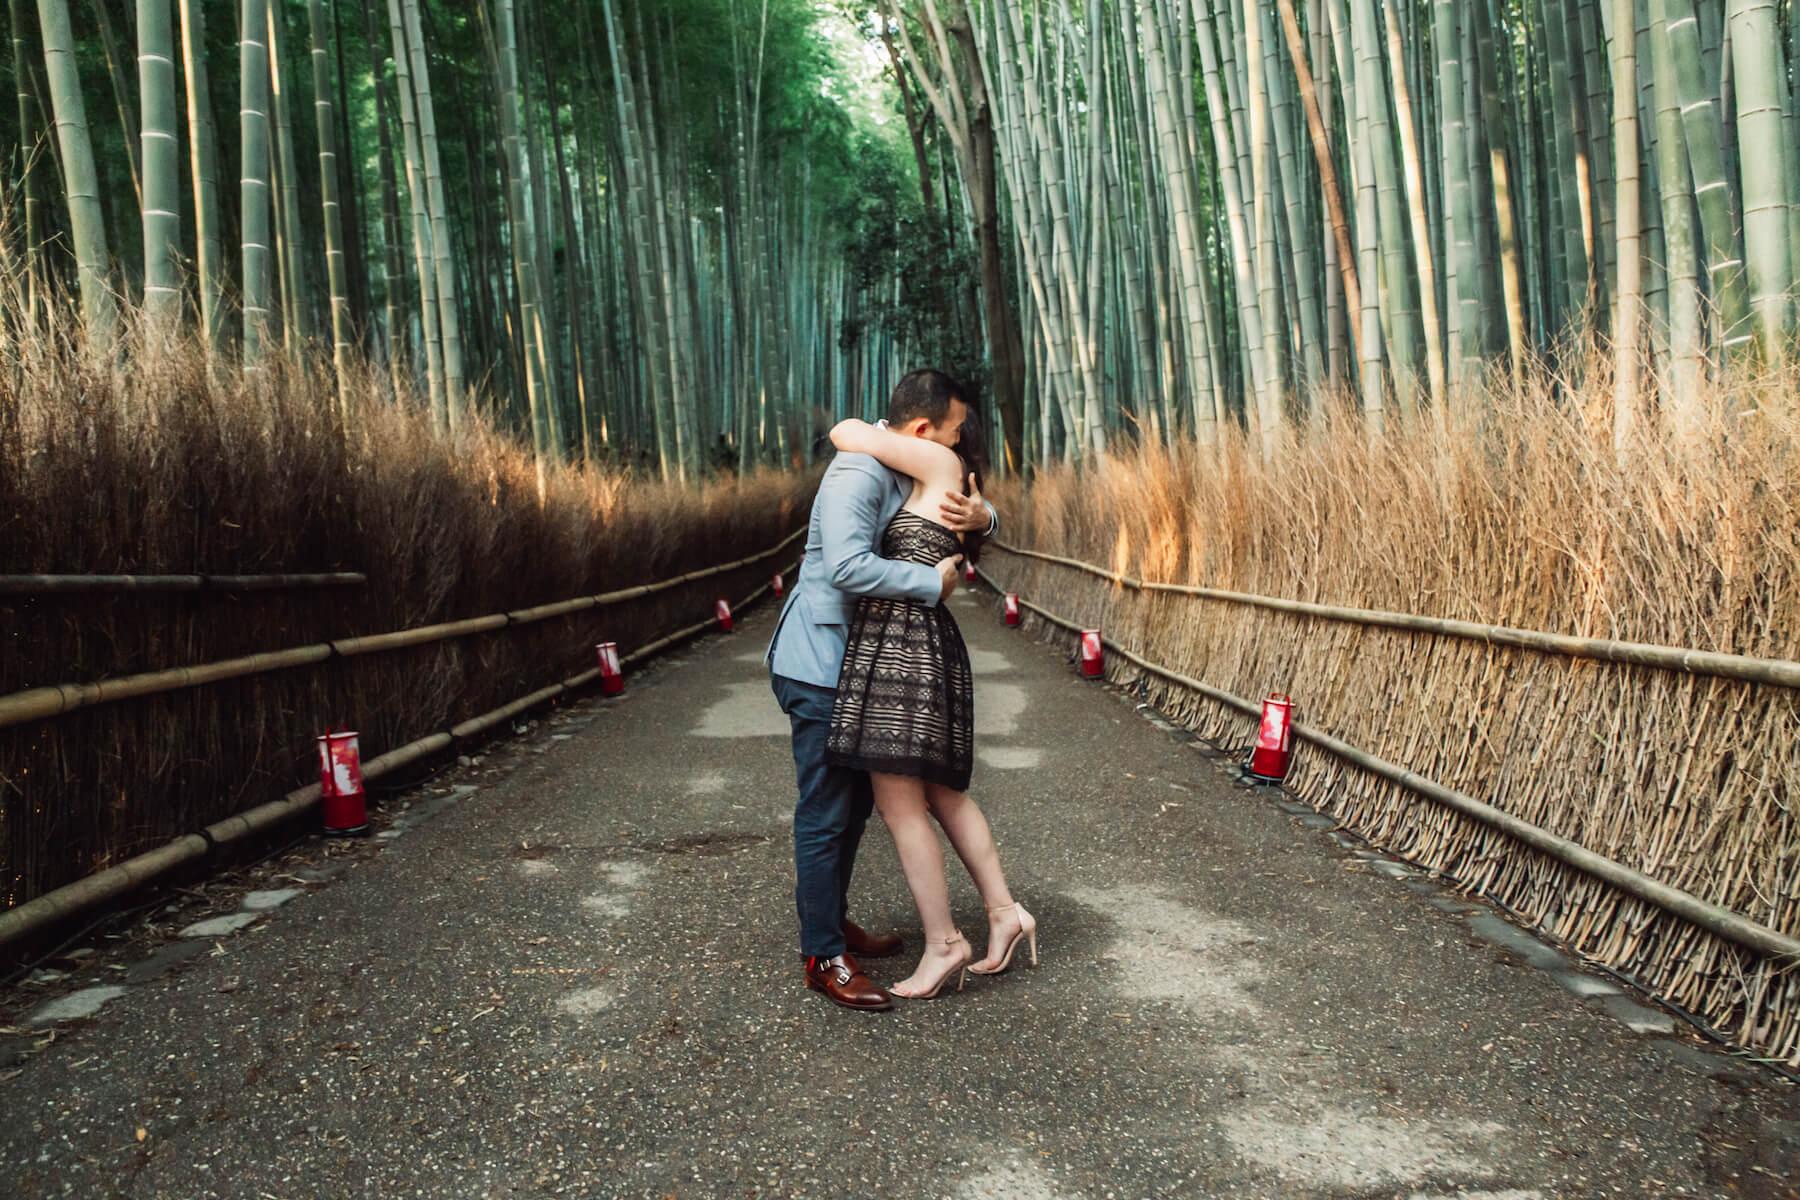 kyoto-12-19-2019-proposal-22_original